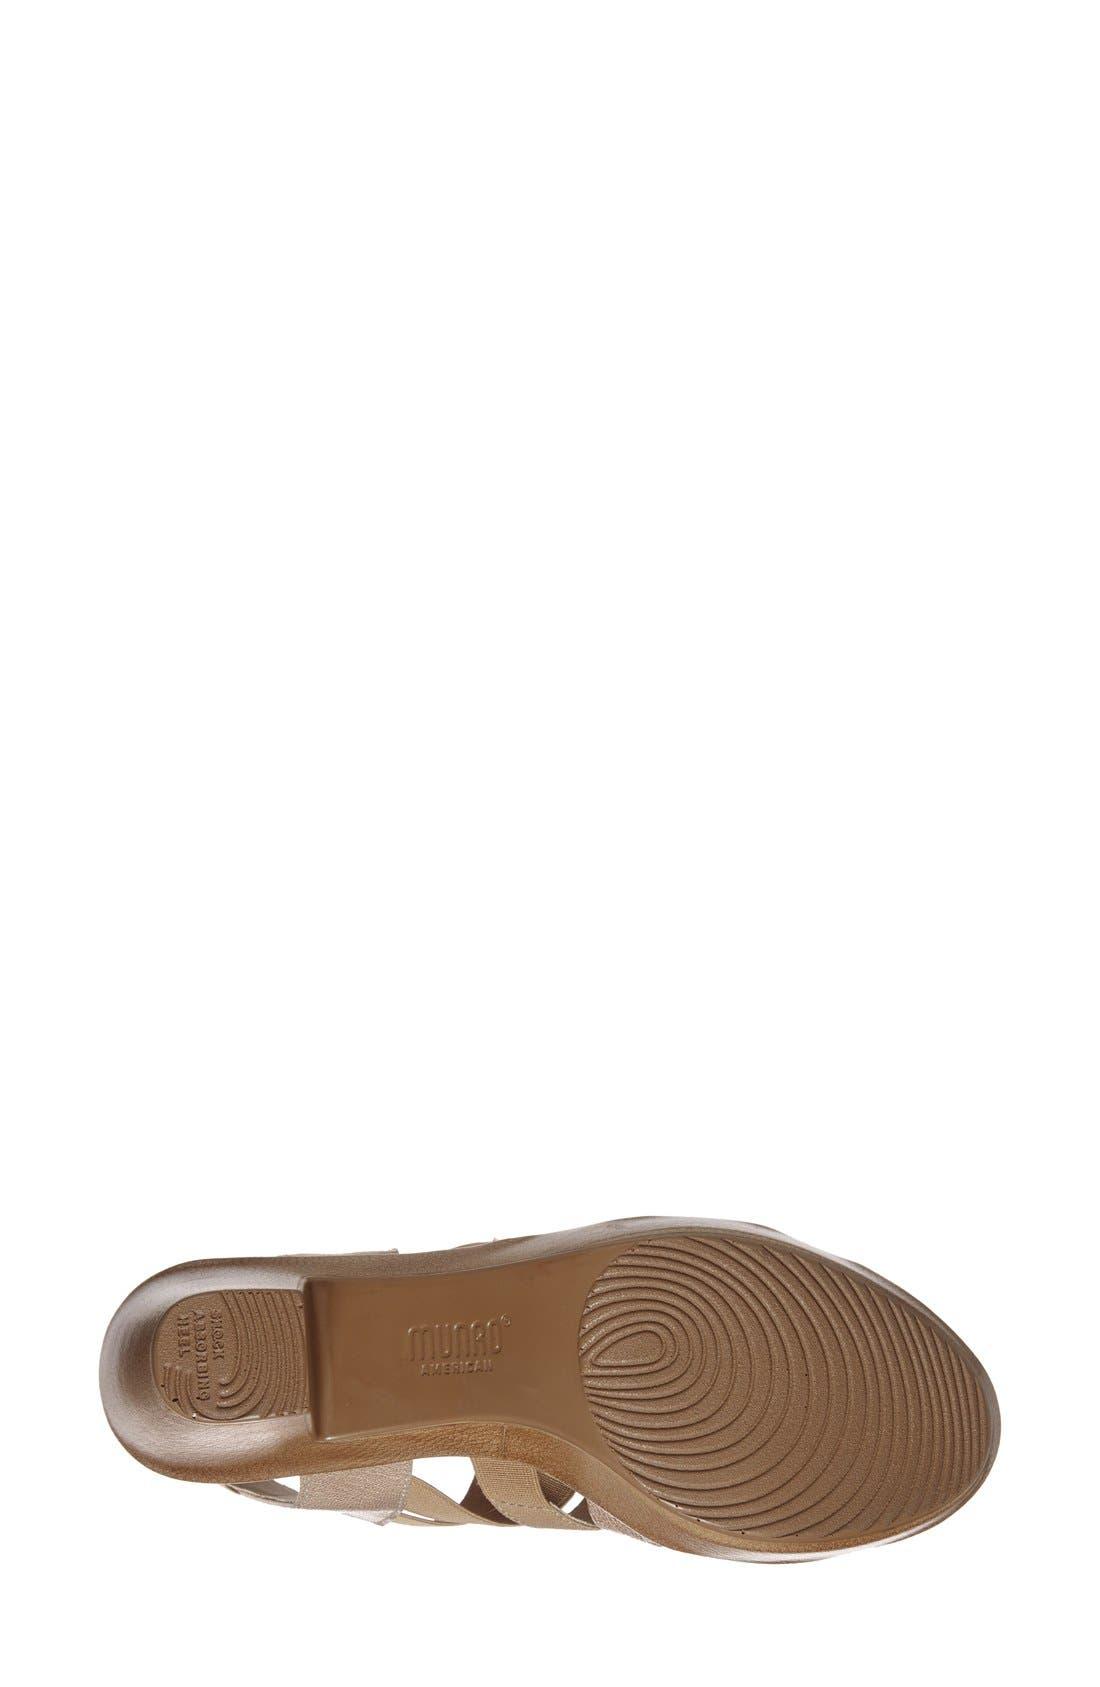 'Cookie' Slingback Sandal,                             Alternate thumbnail 32, color,